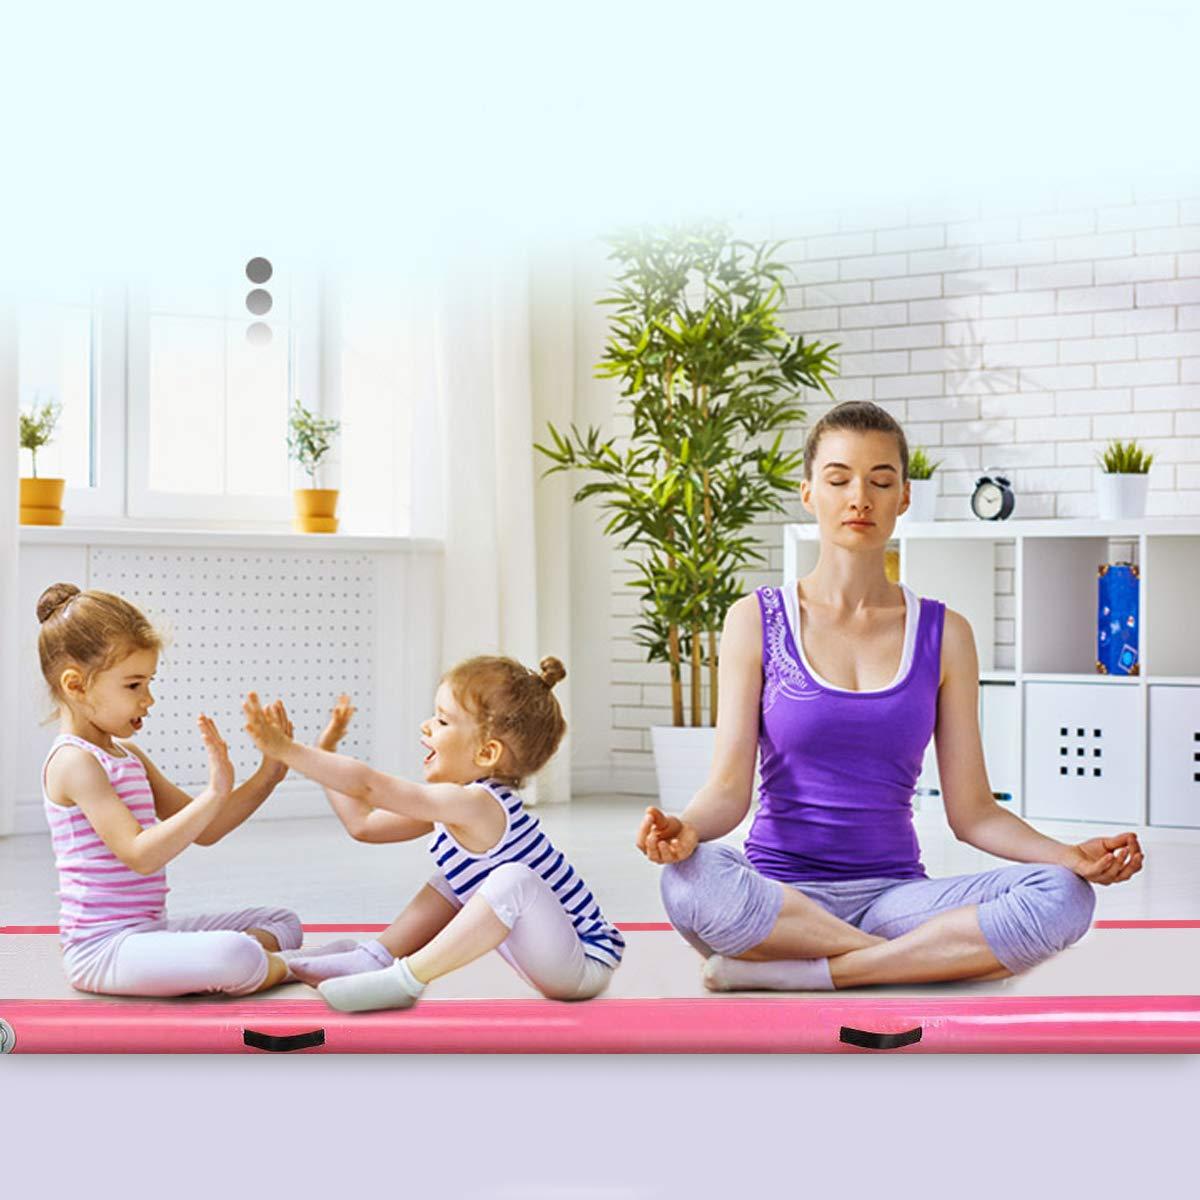 KingSaid 10FT x 3FT Inflatable Gymnastics Mat Air Track Gymnastics Tumbling Mat Portable Gym Exercise Sport Fitness Mat Pink